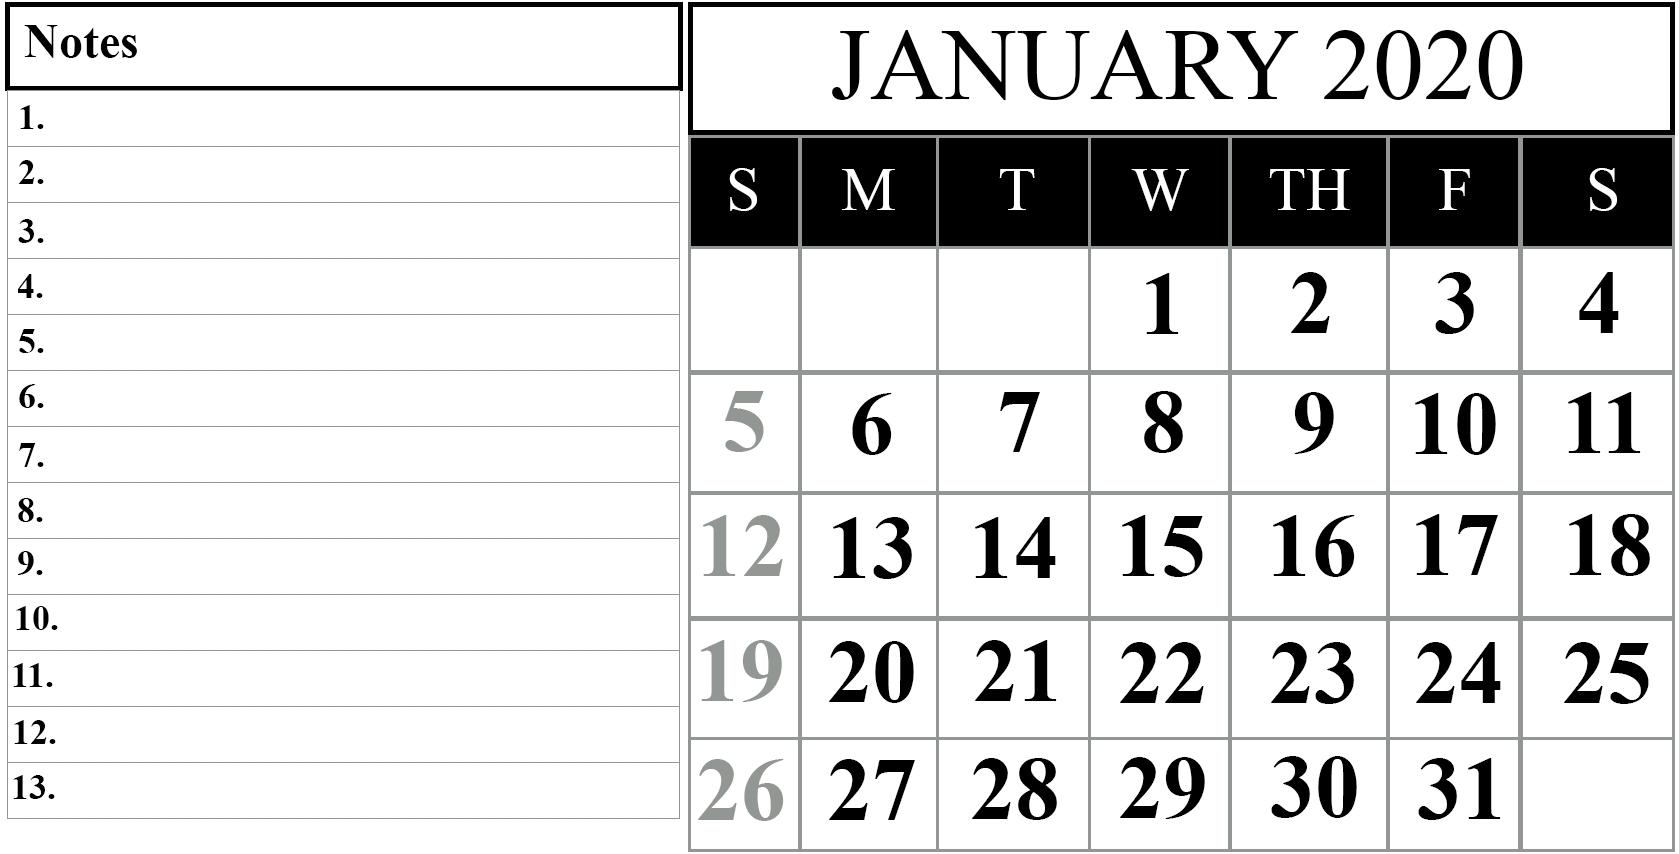 Free Blank January 2020 Calendar Printable In Pdf, Word-January 2020 Calendar Vertical